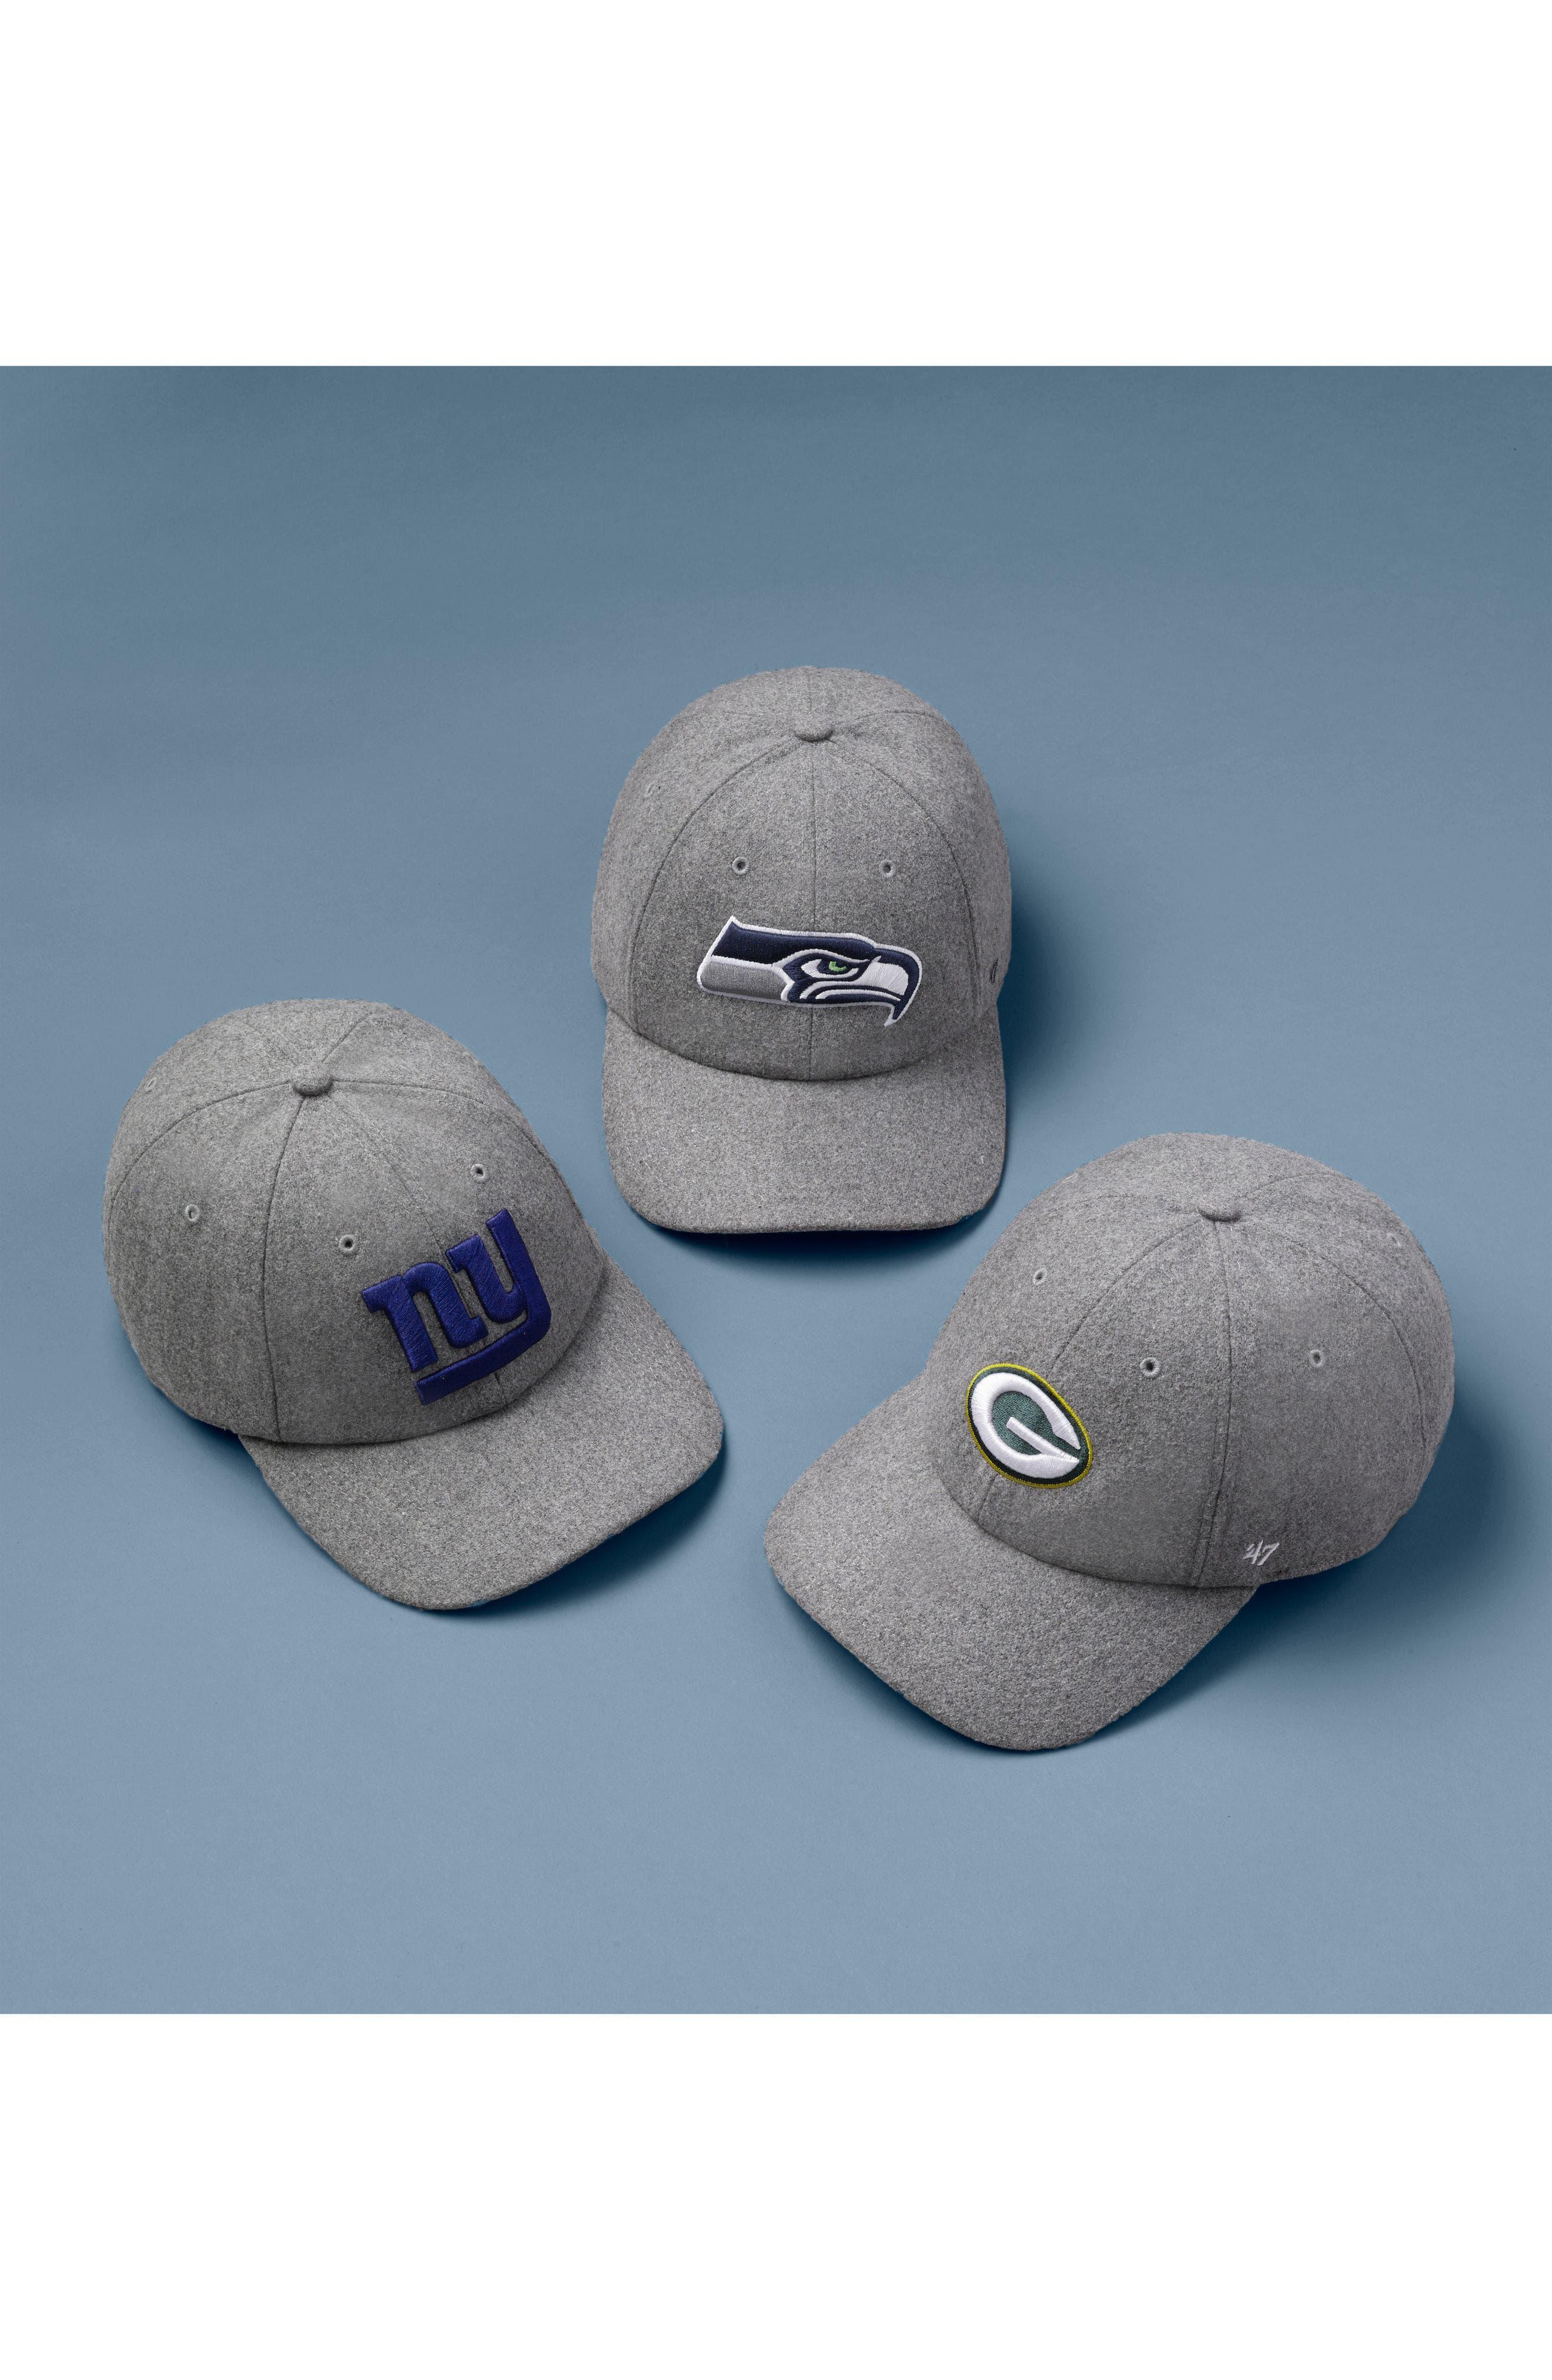 Alternate Image 3  - 47 Brand NFL Clean-Up Ball Cap